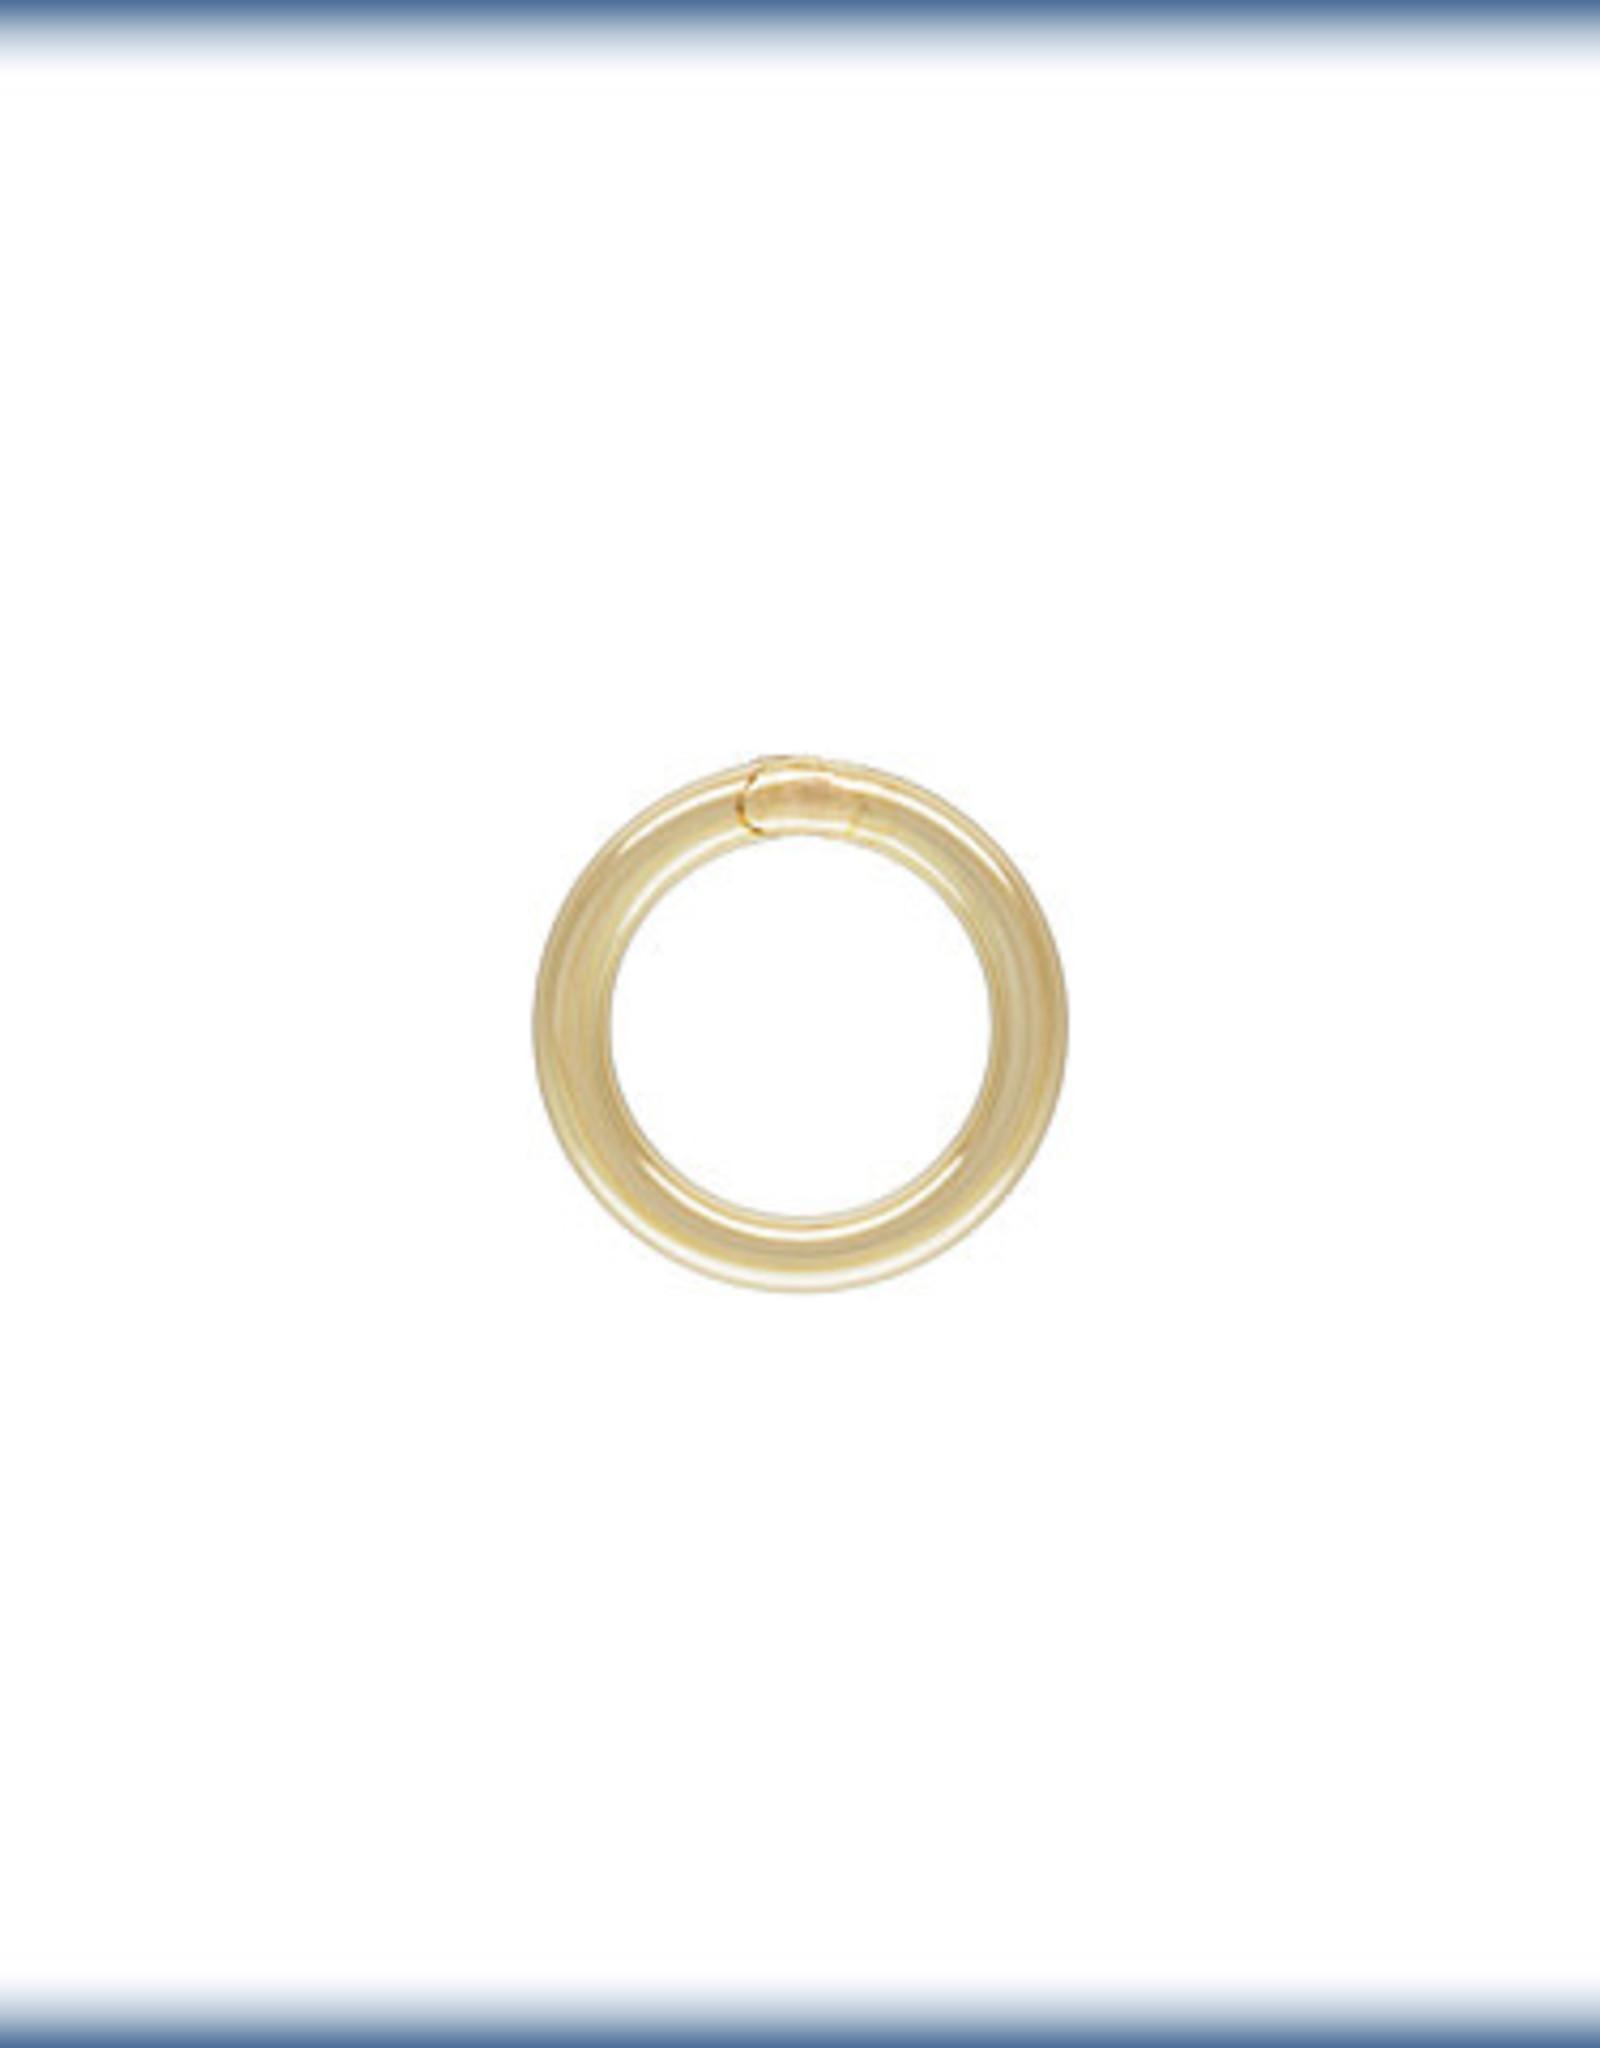 5.5mm Closed Rings 20 ga 14k Gold Filled  Qty 10